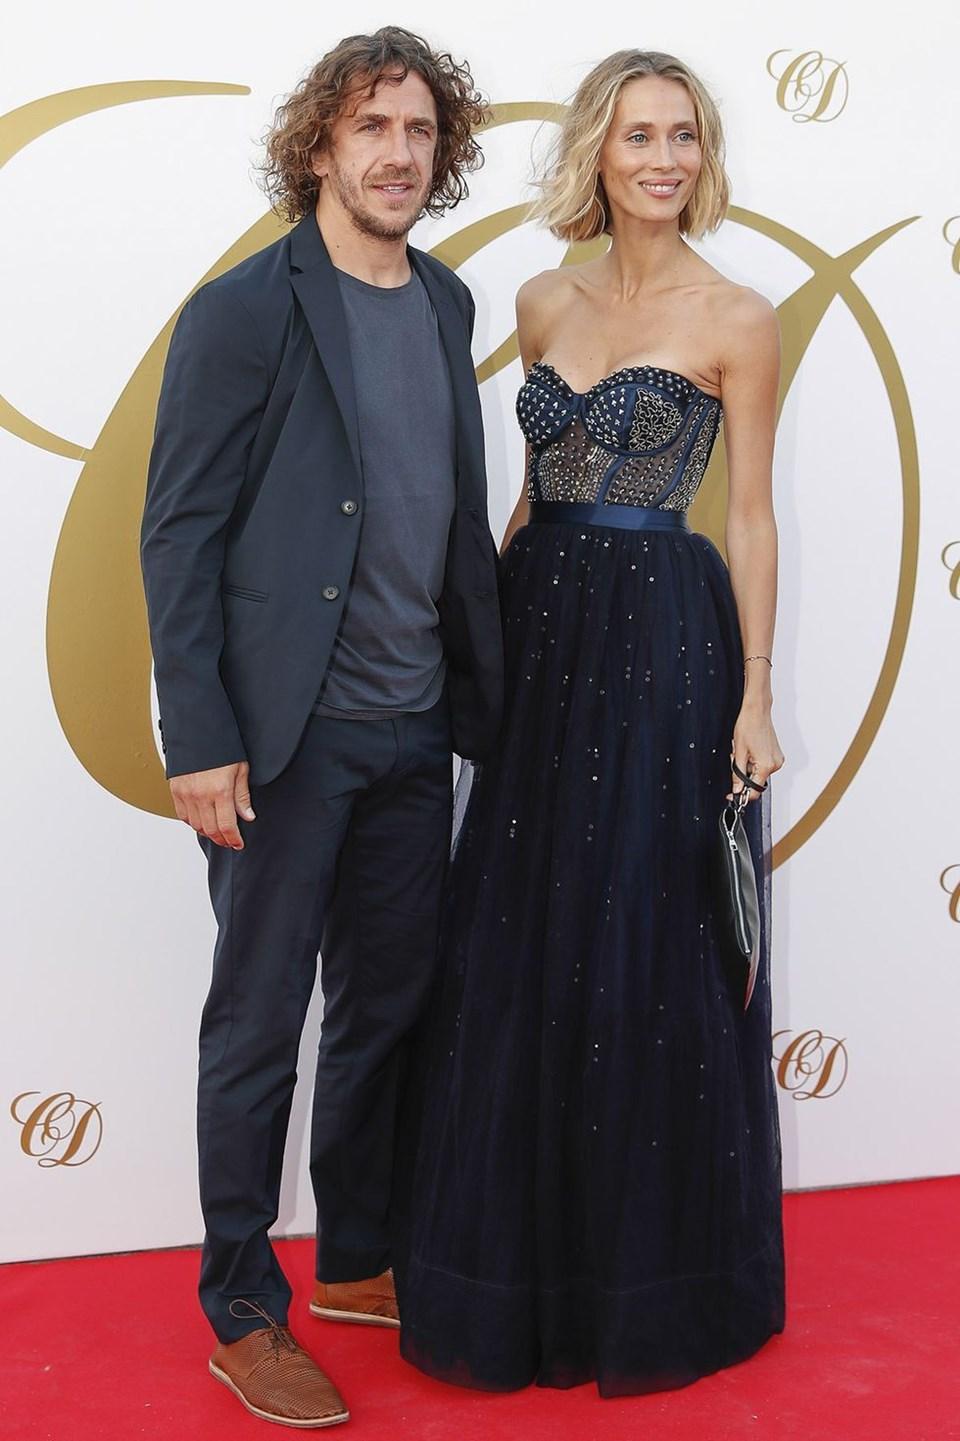 Carles Puyol ve Vanesa Lorenzo